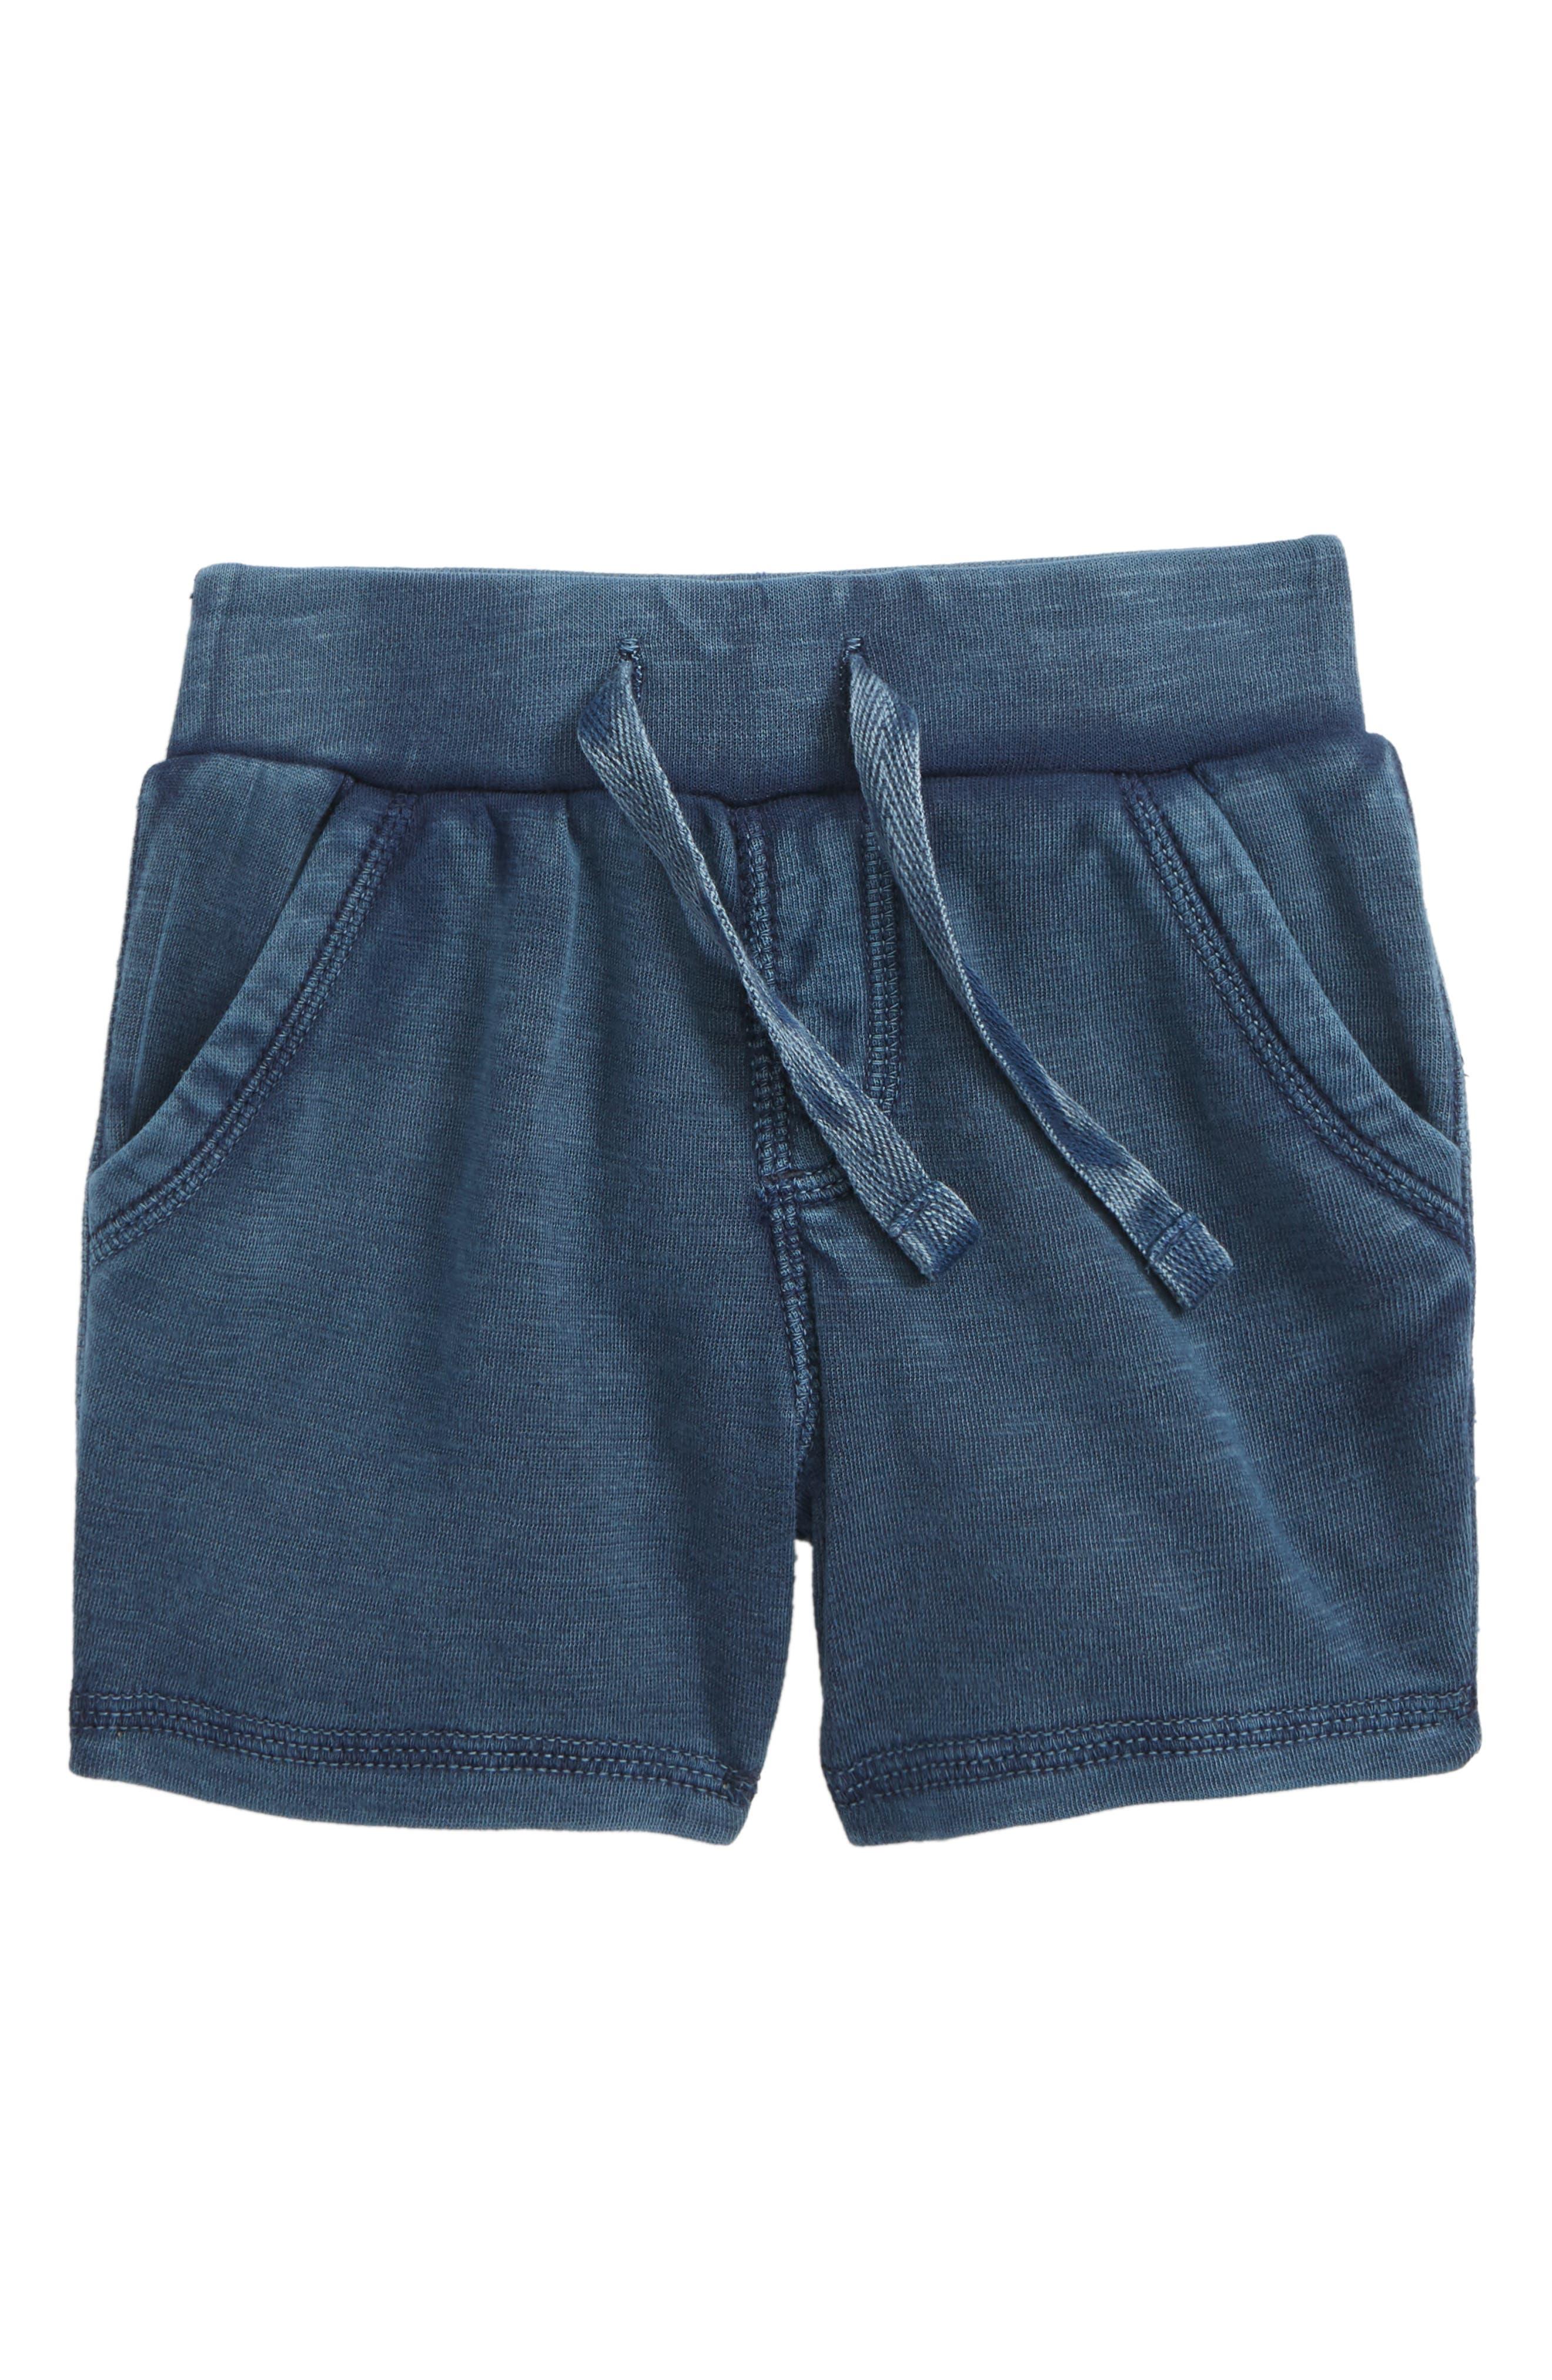 Alternate Image 1 Selected - Tucker + Tate Knit Shorts (Baby Boys)